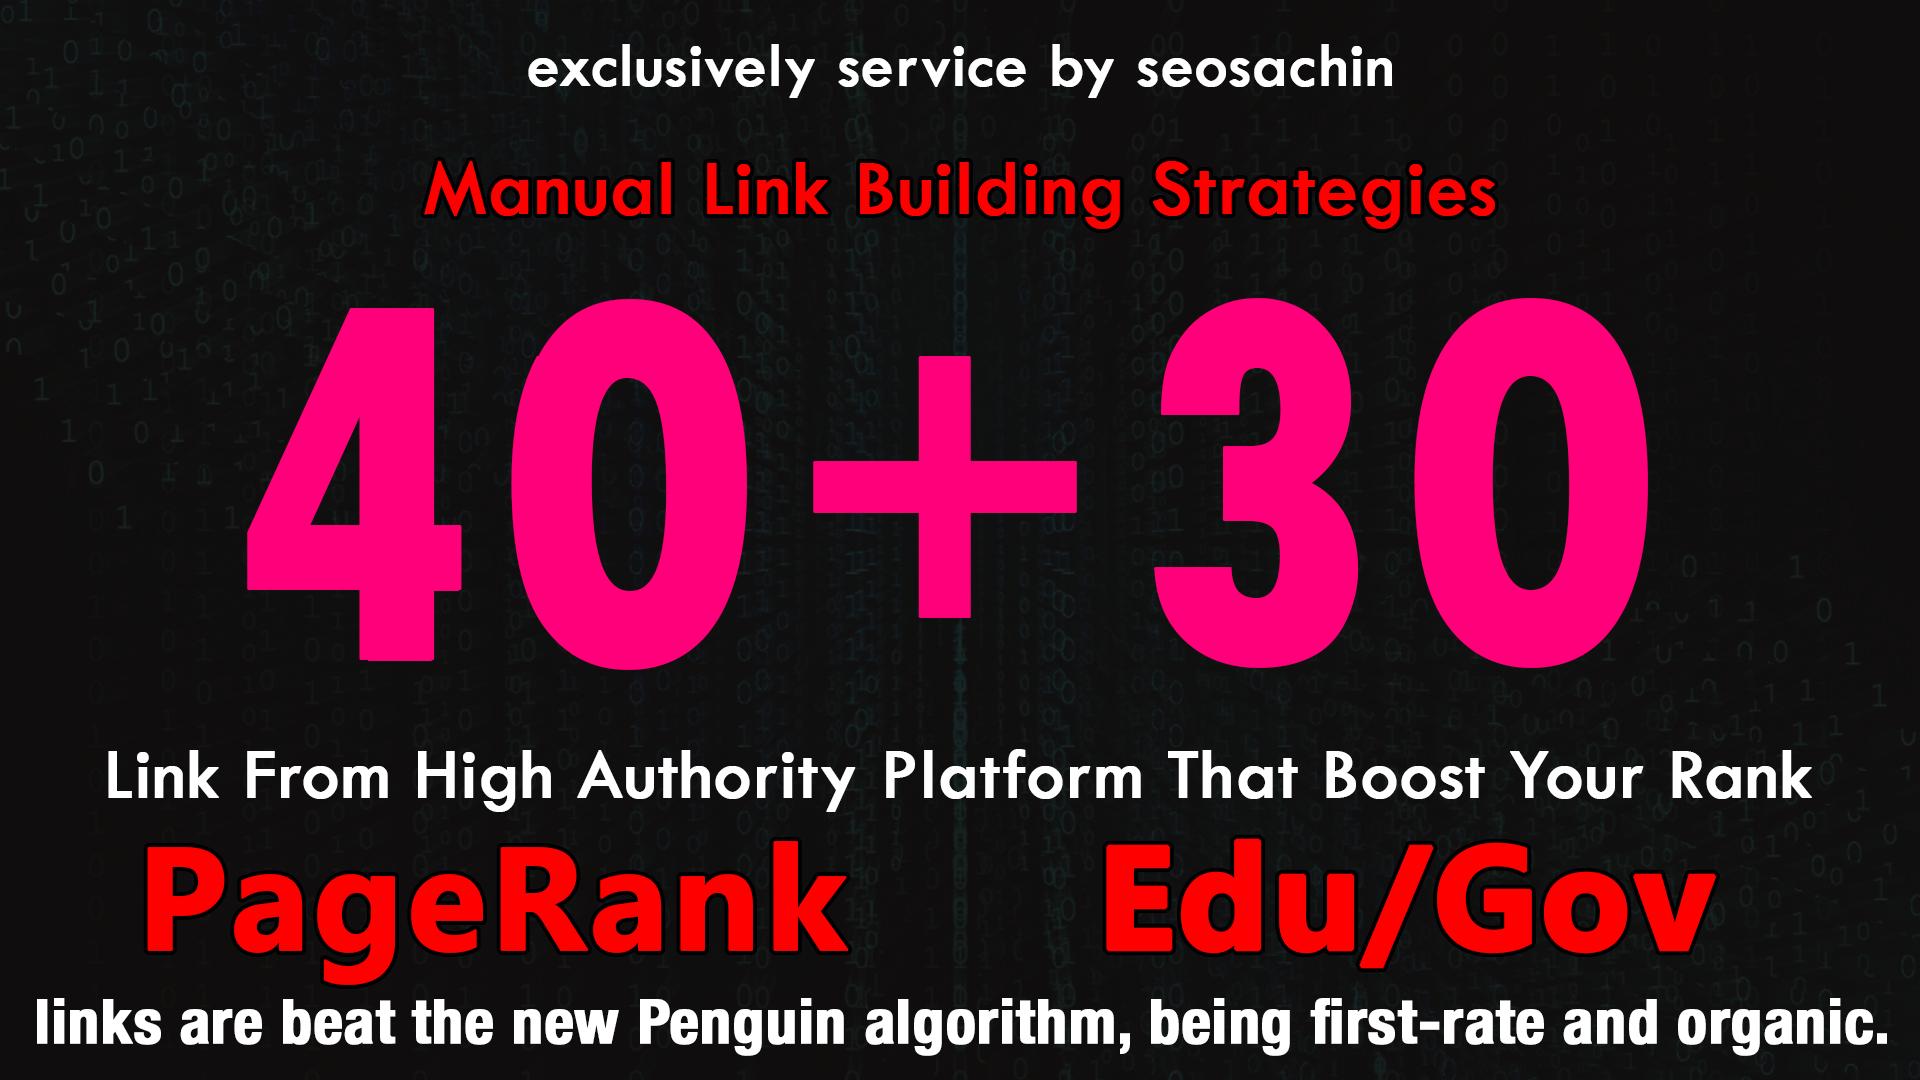 Skyrocket Your Google Rankings, With 40 PR9 + 30 EDU GOV Permanent Backlinking